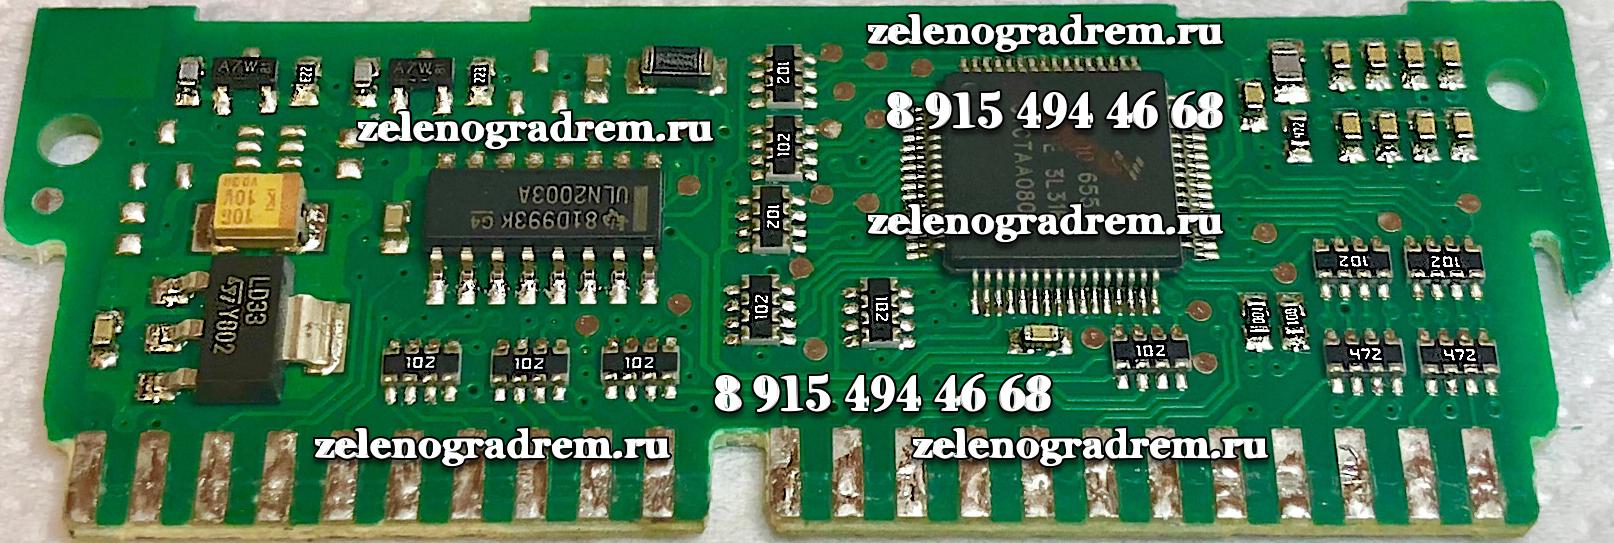 Субмодуль Электронного Модуля Indesit